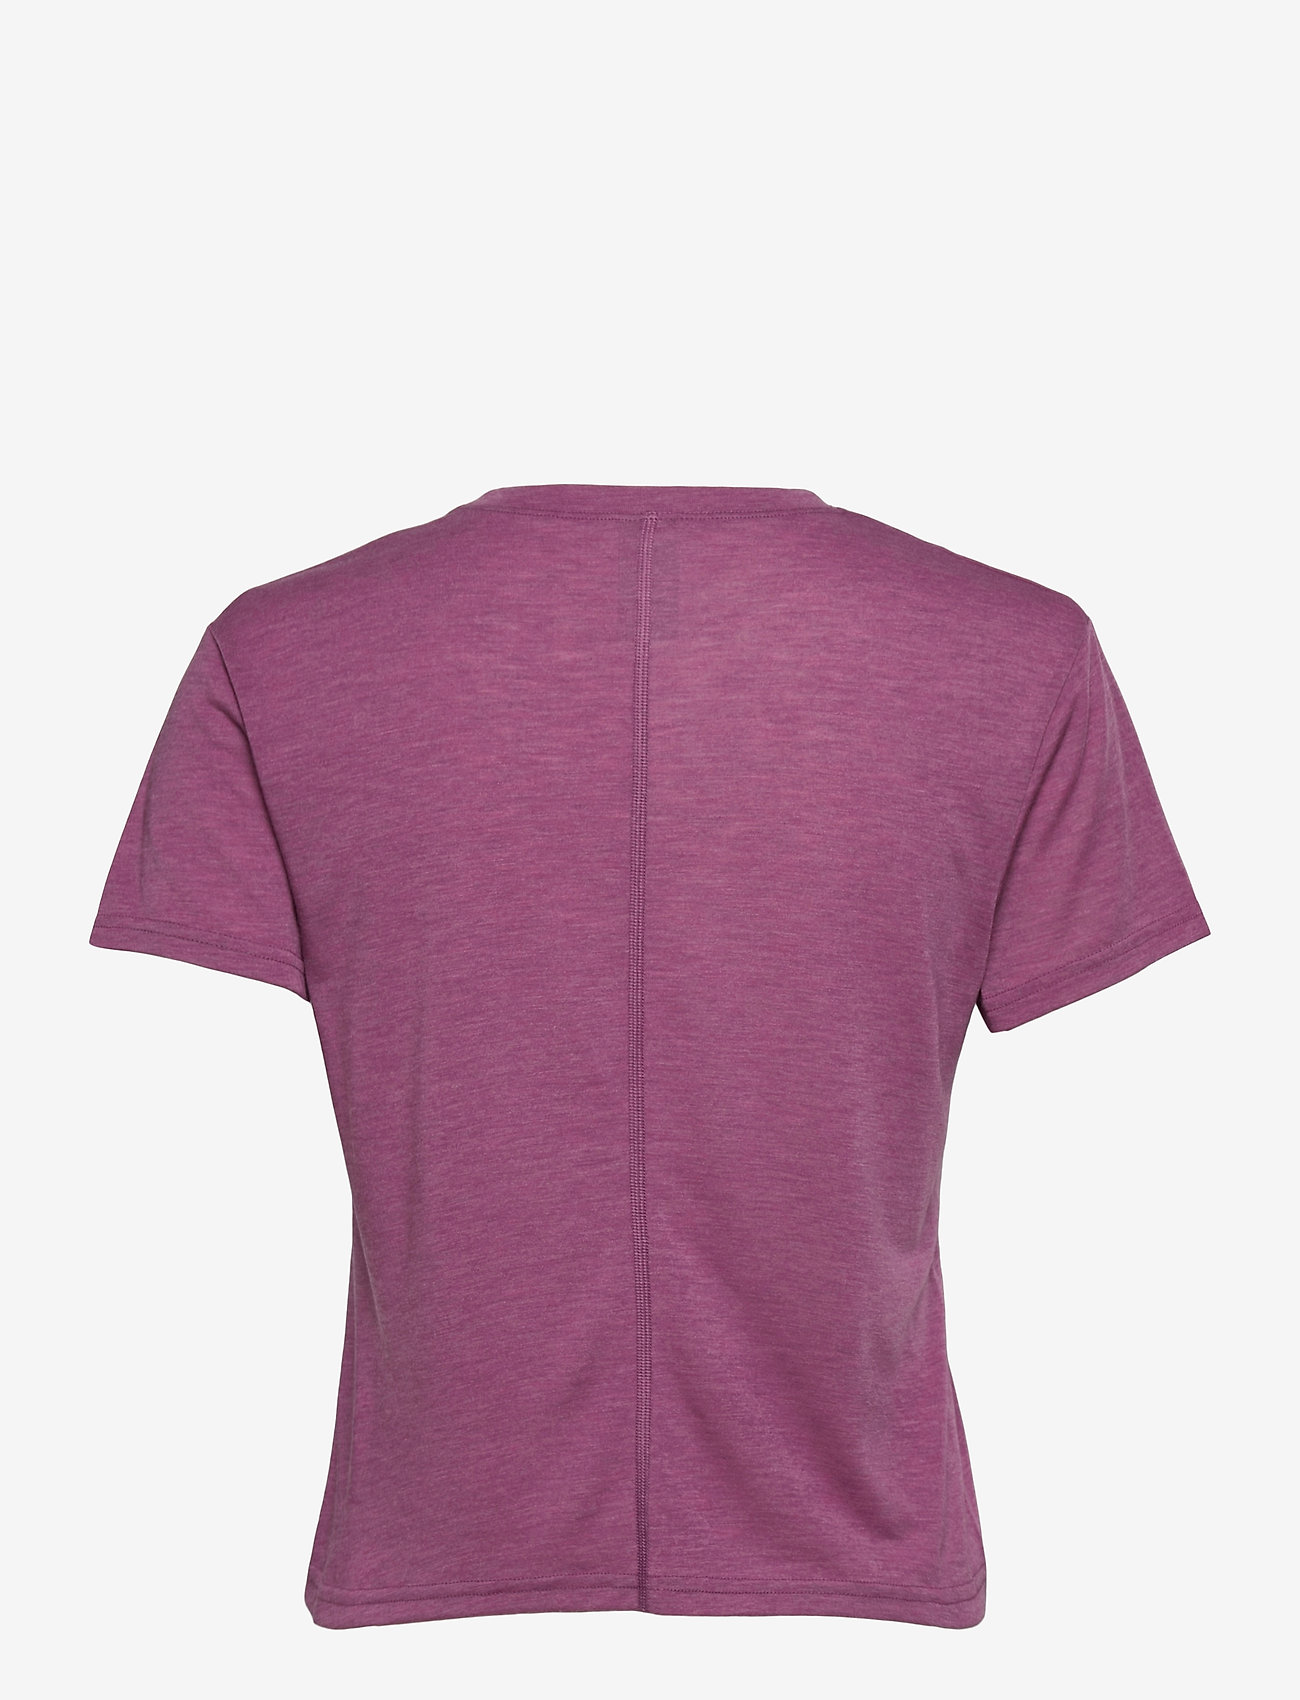 Johaug - Aerial Woolmix Tee - t-shirts - orchd - 1